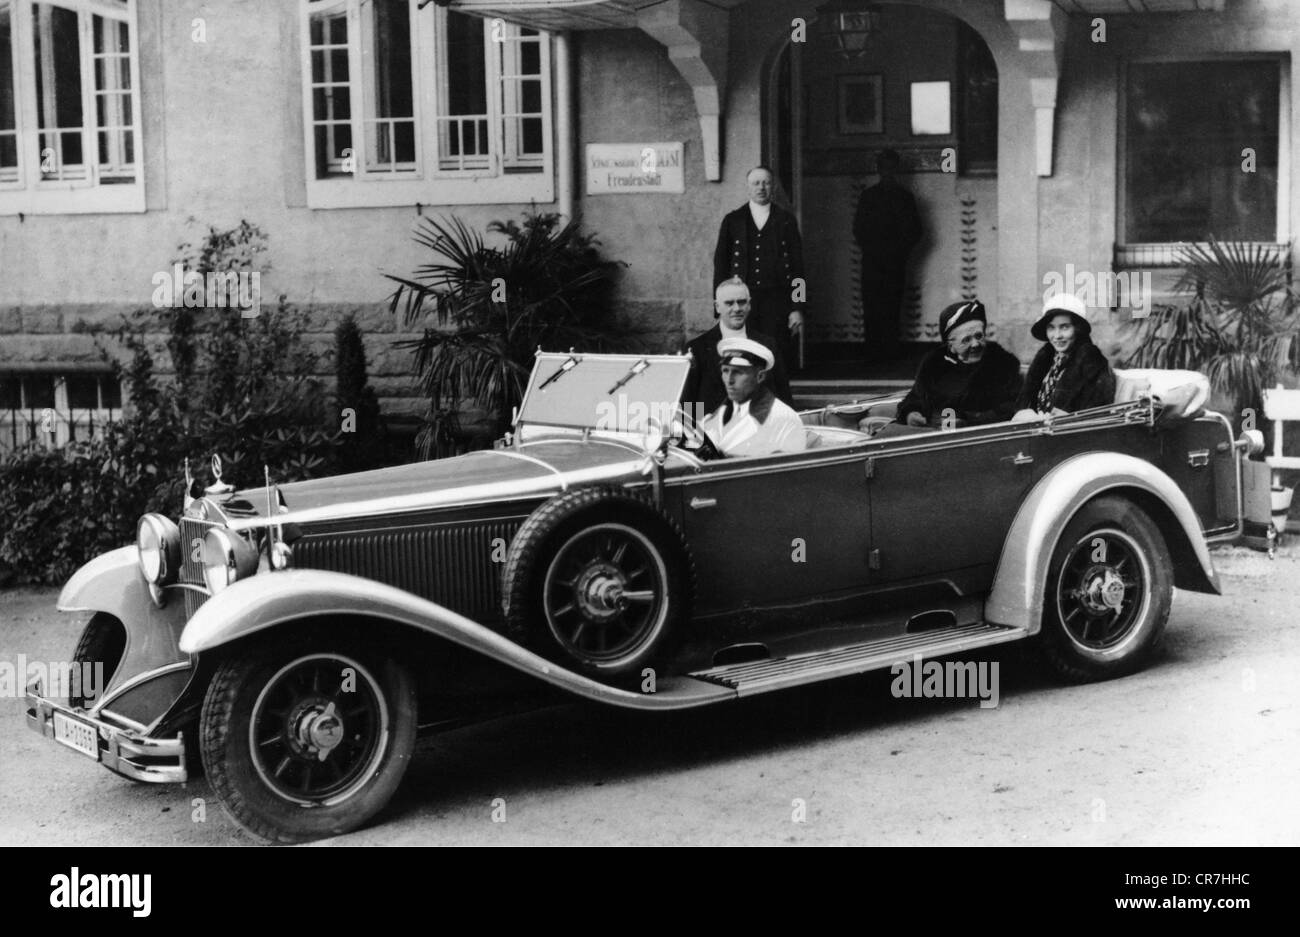 Emma, 2,8,1858 - 20.3.1934, Queen of the Netherlands 7.1.1879 - 23.11.1890, in a Mercedes-Benz Nuerburg 460, Freudenstadt, circa 1930, Stock Photo